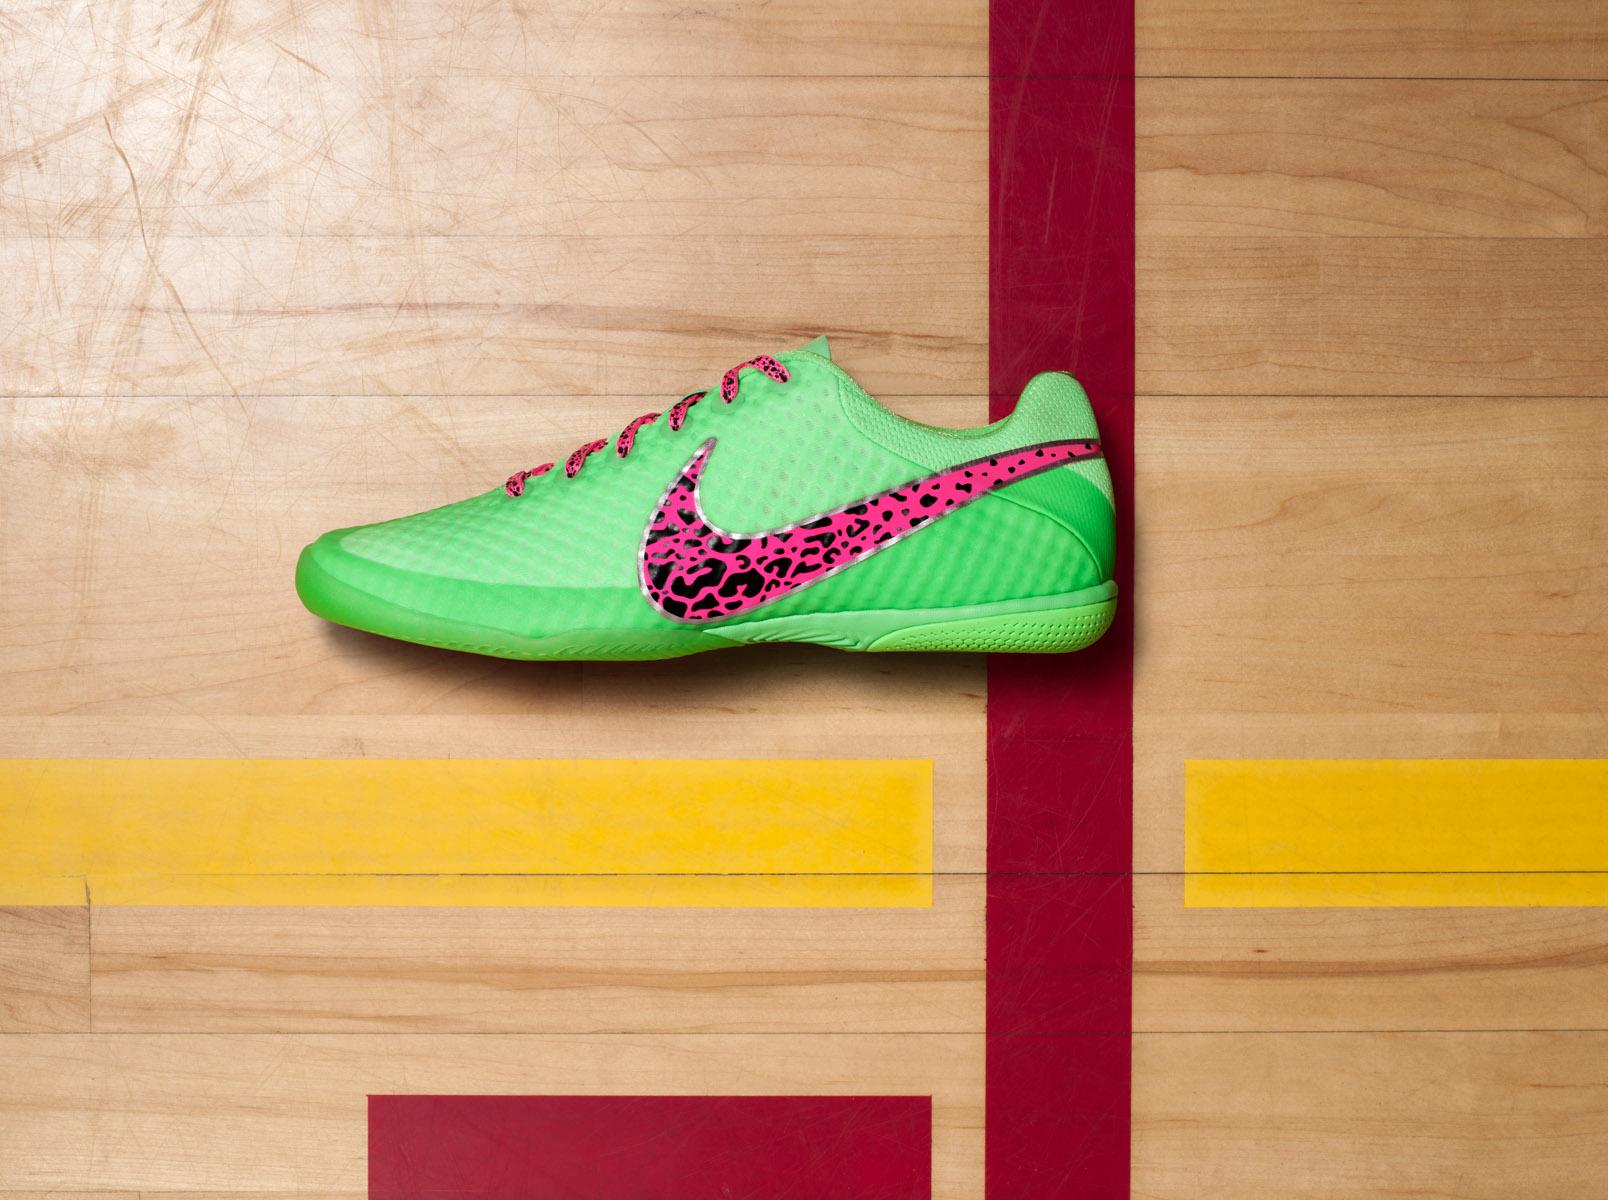 Nike_Elastico_Finale_II_Profile_original.jpg